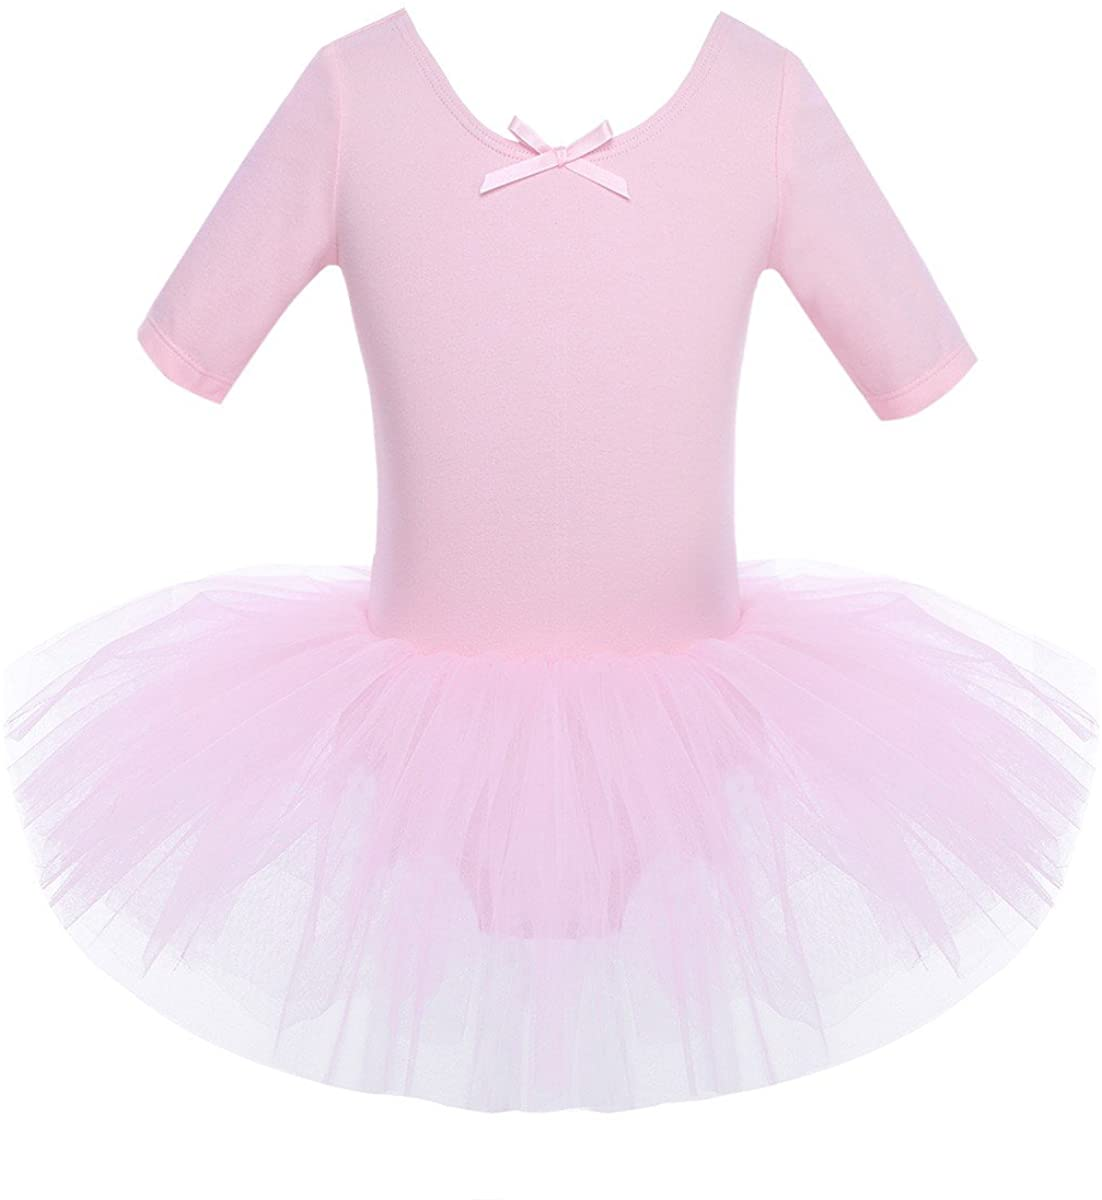 Freebily Kids Girls Half Sleeve Tutu Dress Leotard Fairy Tulle Ballet Dance Gymnastic